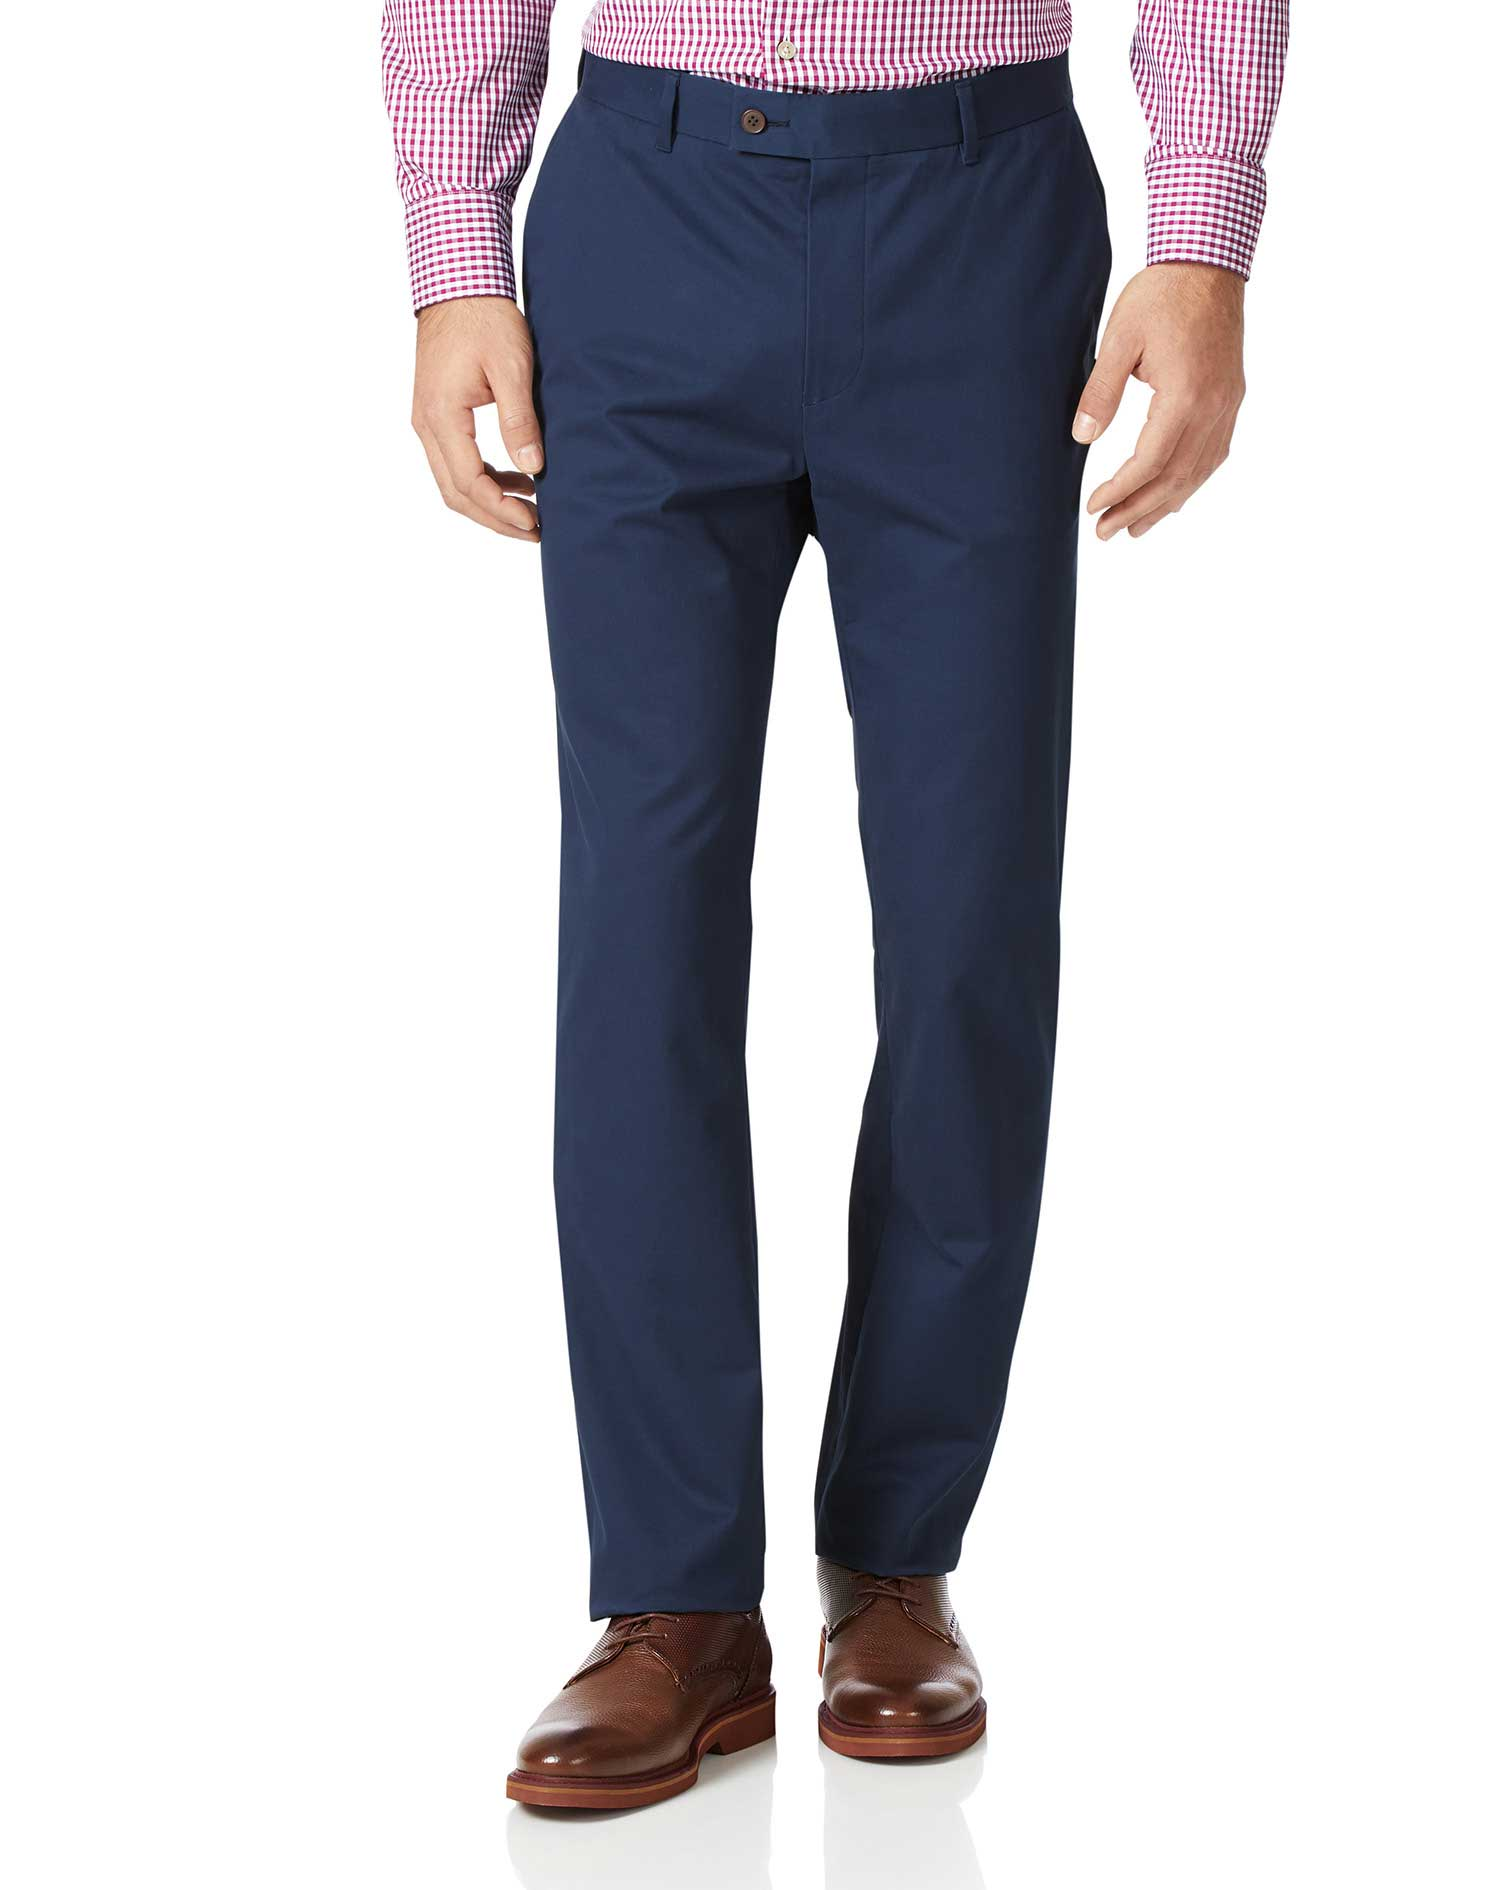 Dark Blue Slim Fit Stretch Cotton Chino Trousers Size W32 L32 by Charles Tyrwhitt